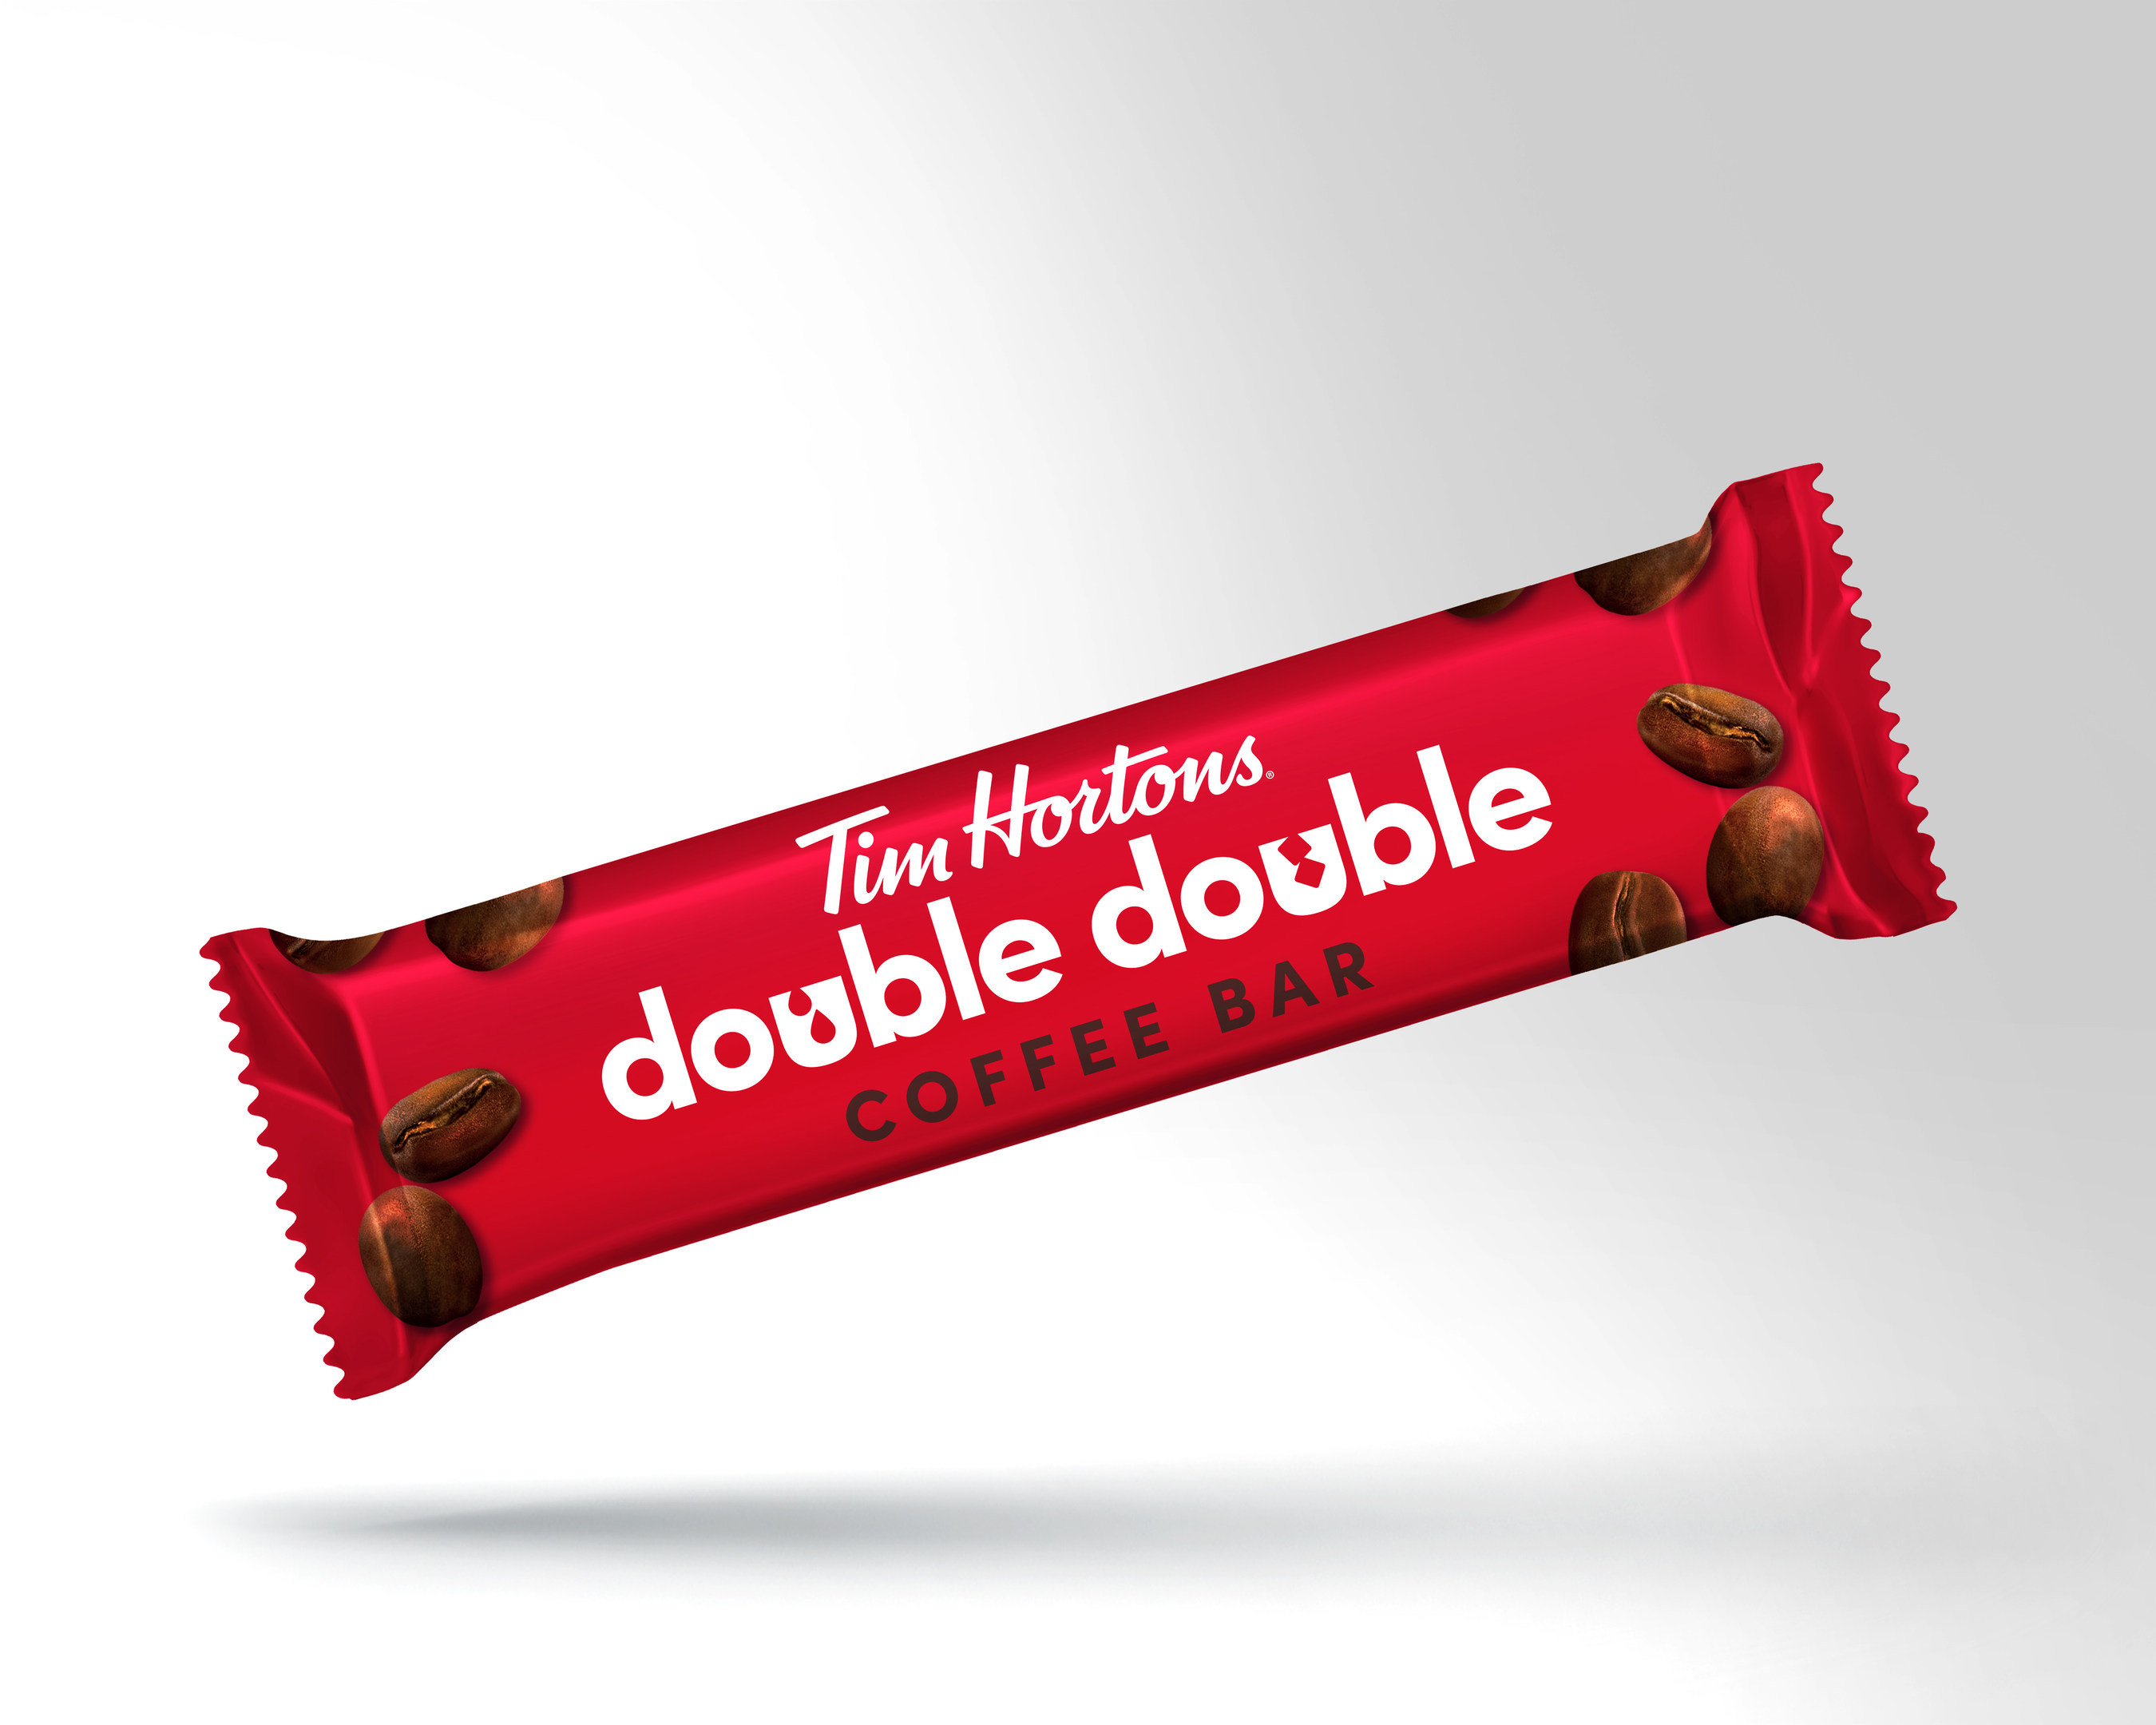 Tim Hortons unveils new Double Double